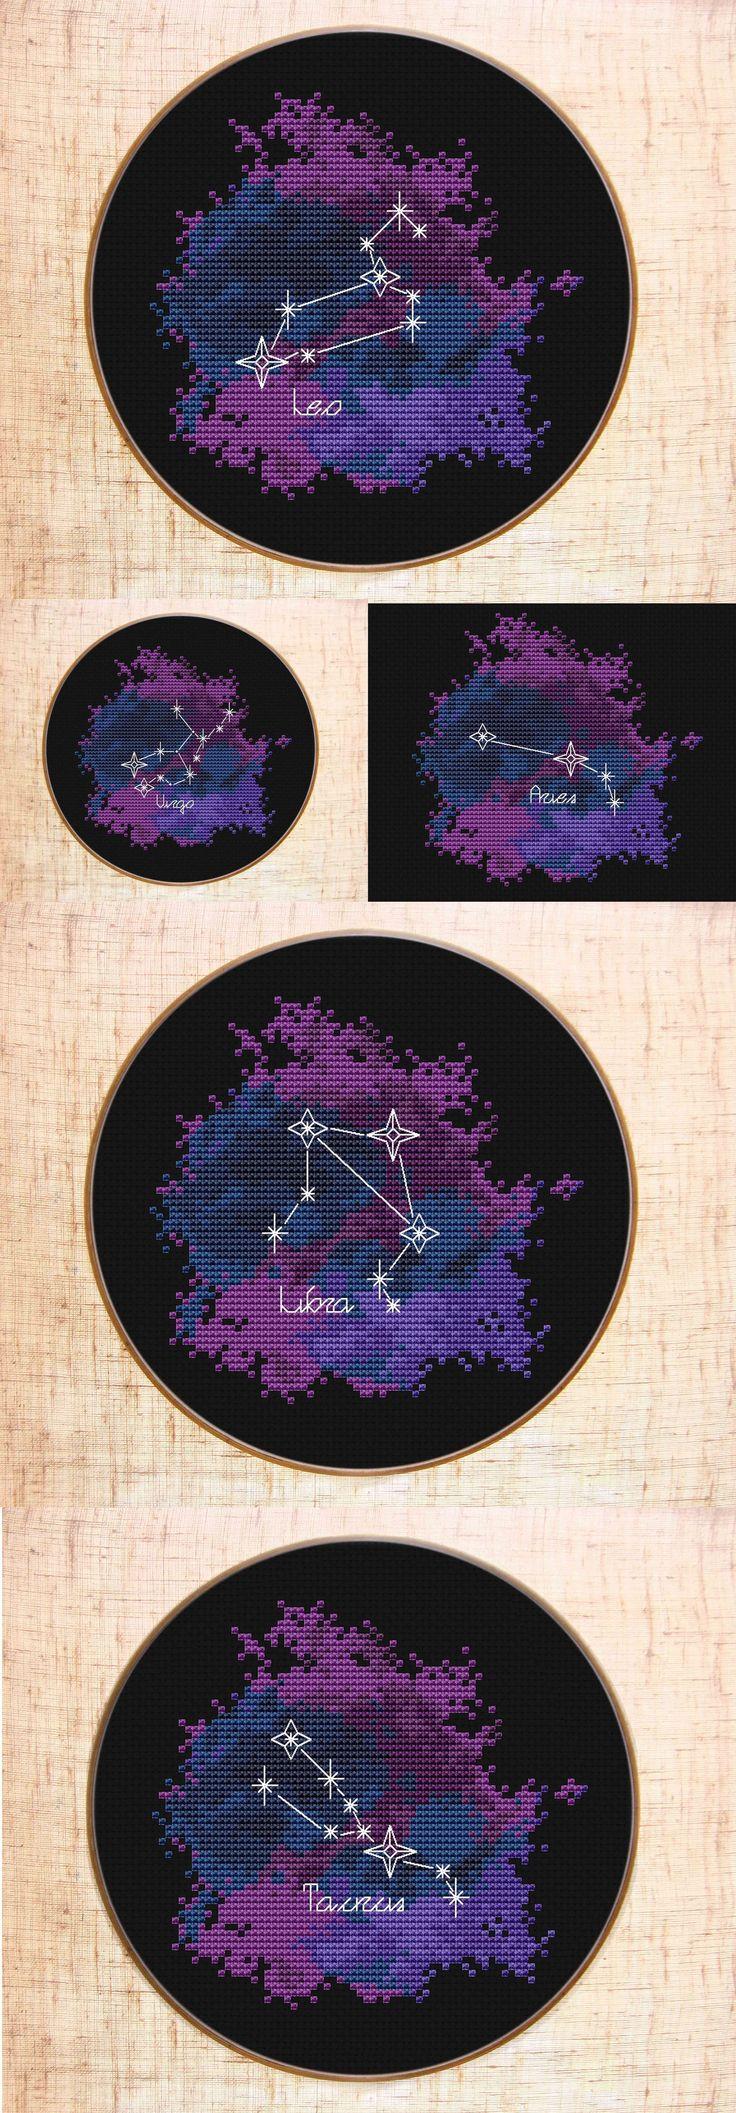 Constellation Cross stitch patterns | Zodiac sign cross stitch Galaxy | Celestial x-stitch #crossstitch #crossstitchpatterns